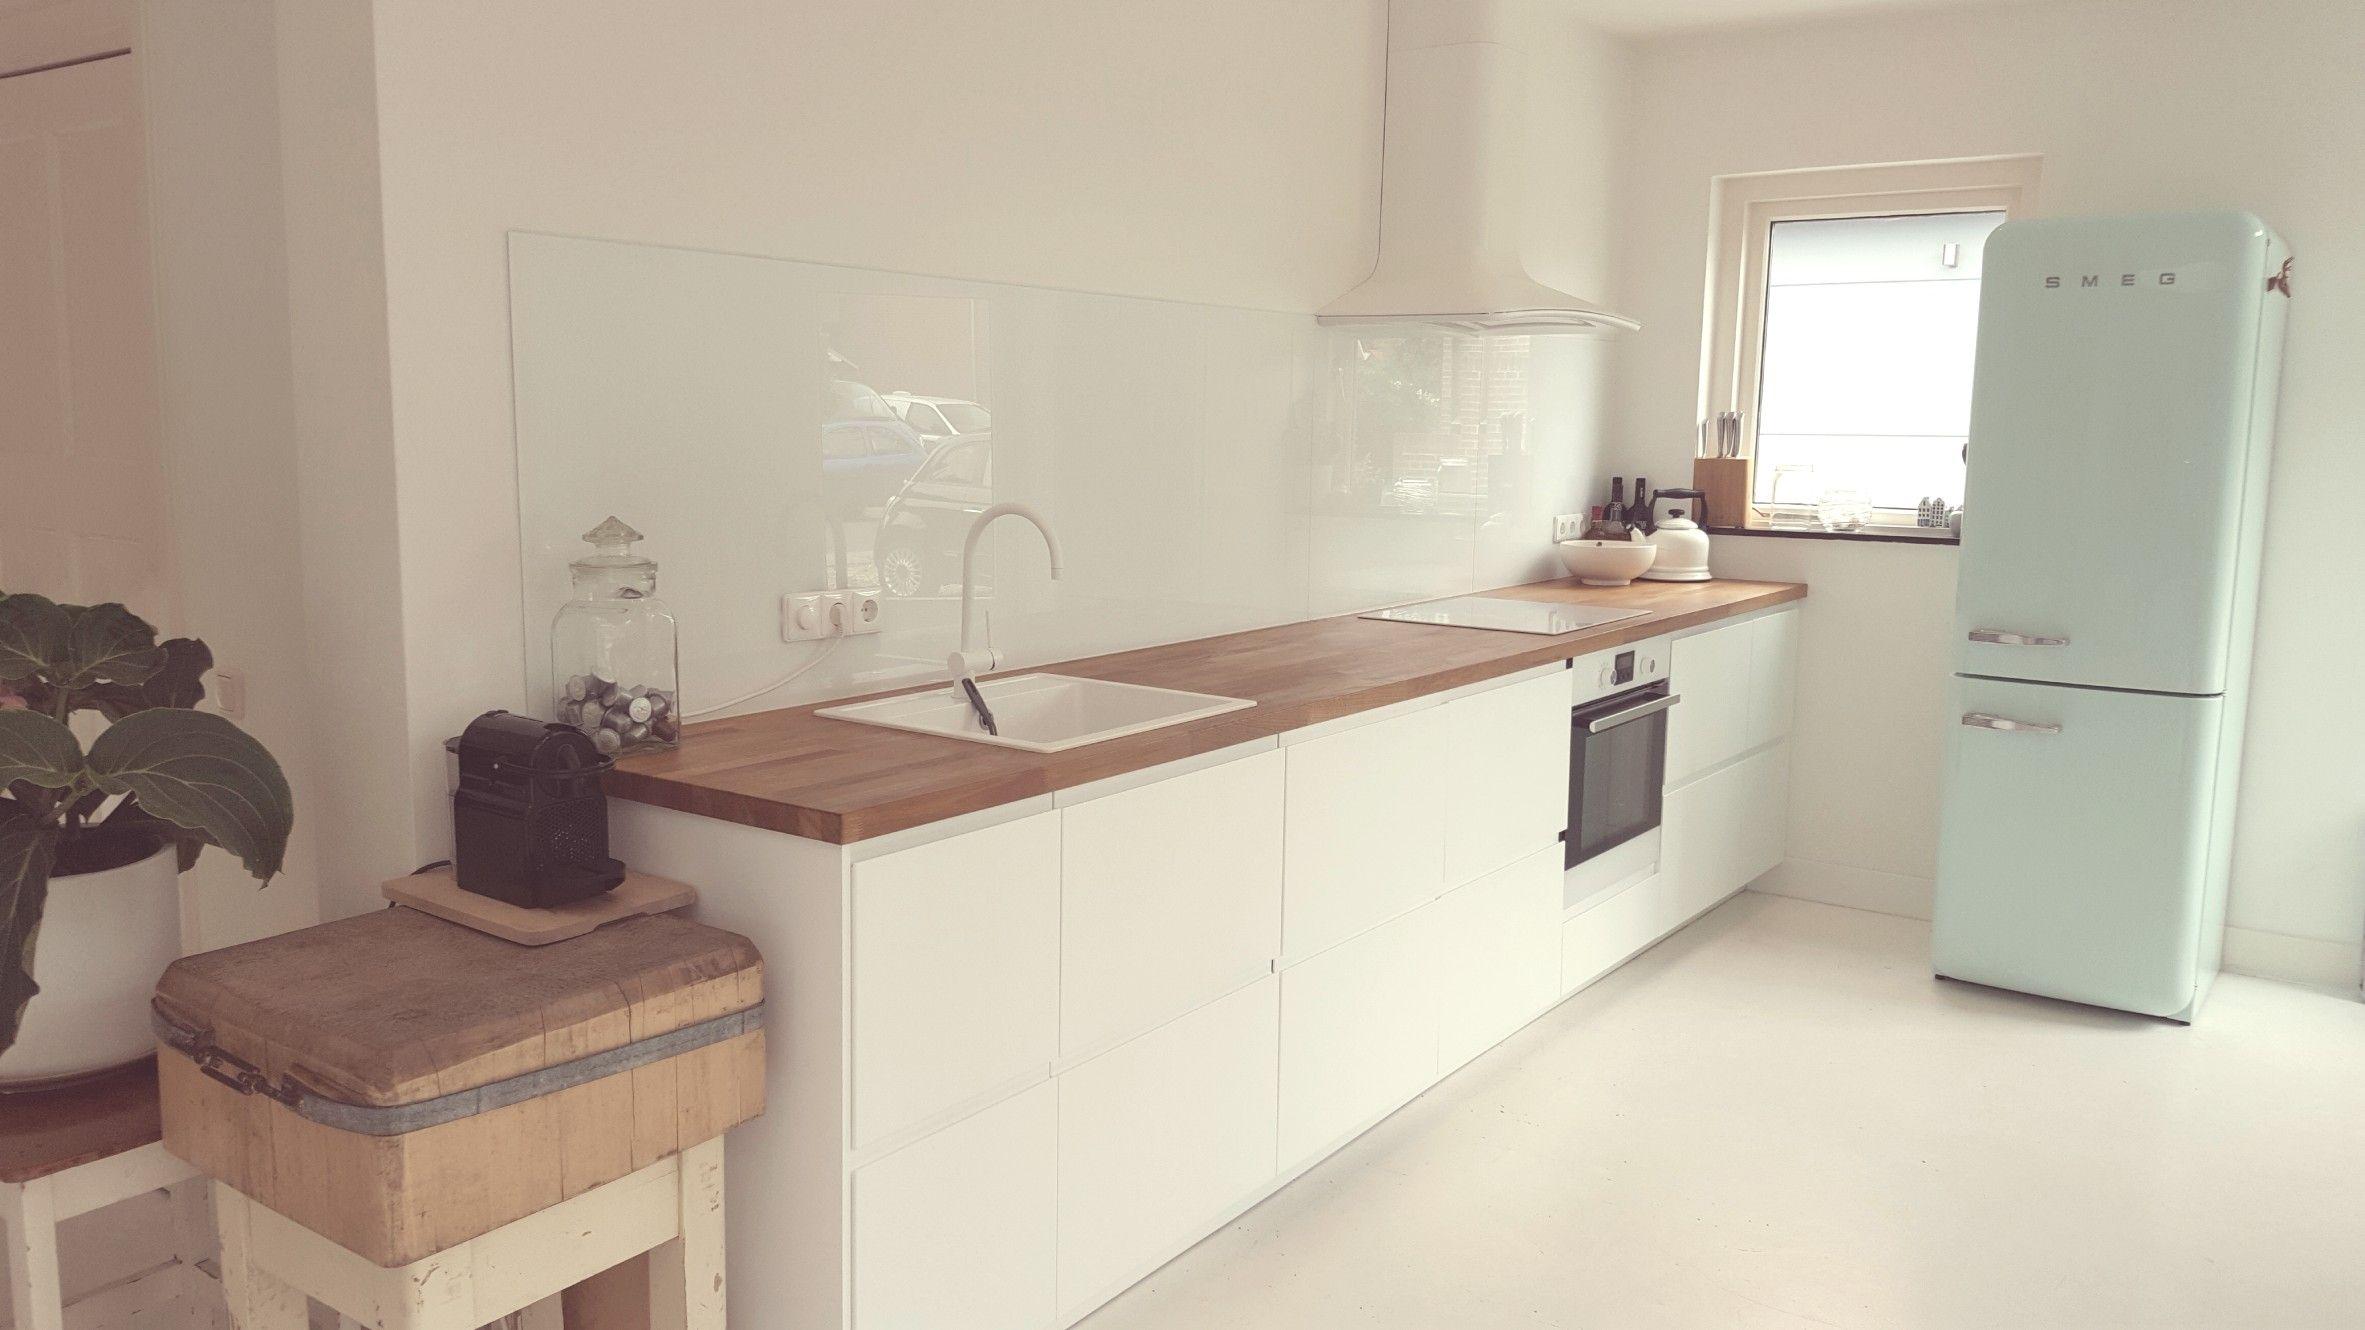 Küchenrückwand Ikea ~ Ikea voxtorp keuken met eiken houten werkblad janine